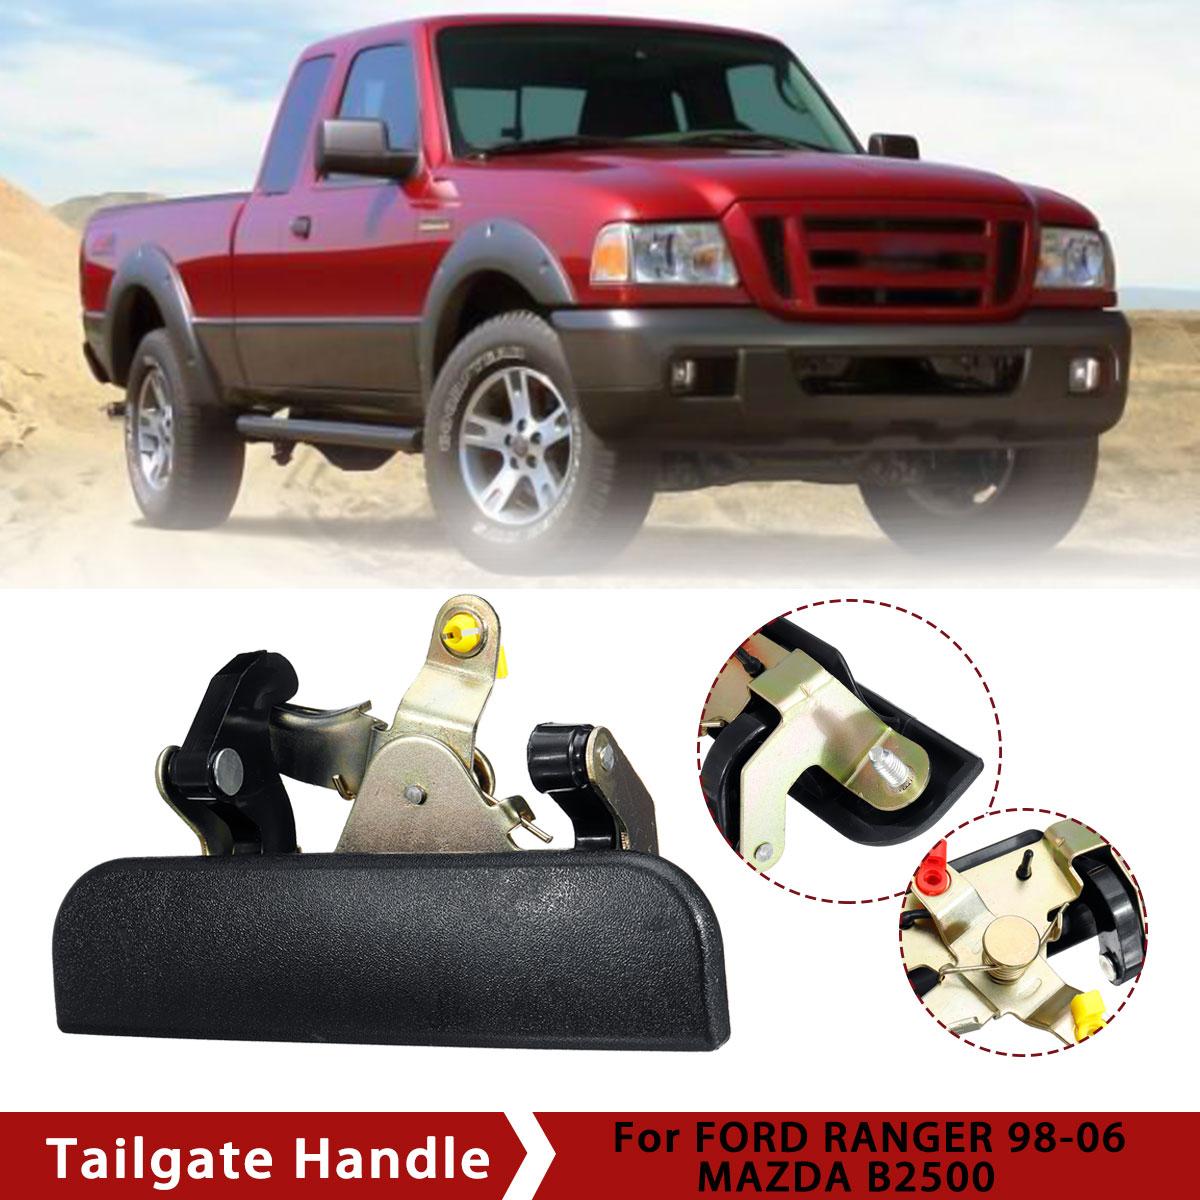 FITS FORD RANGER Tailgate Handle Black 1998 1999 2000 2001 2002 2003 2004